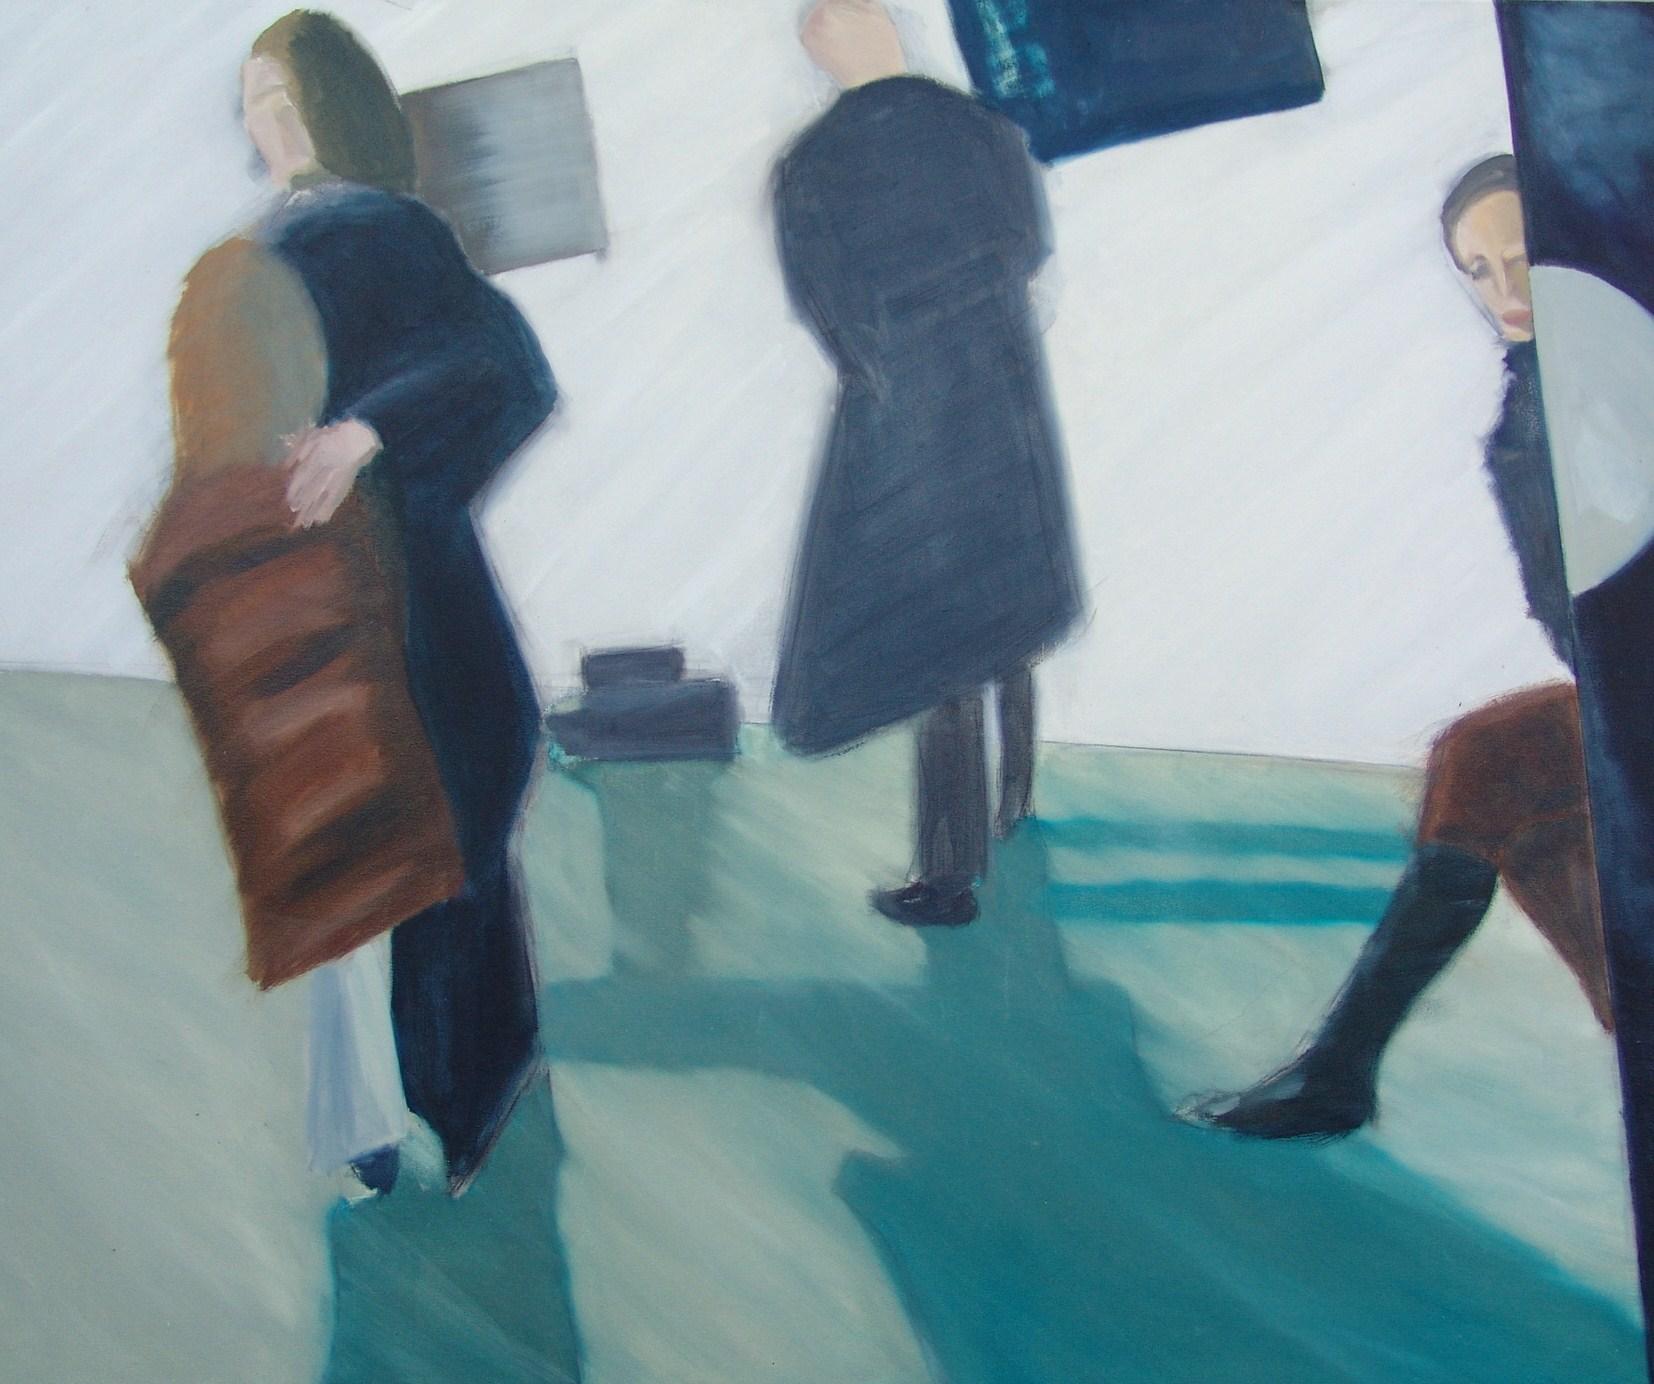 """Der Übergang ist fließend"" - Künstler: Sven Blatt | 2007 | 90 x 140 | Öl auf Leinwand"